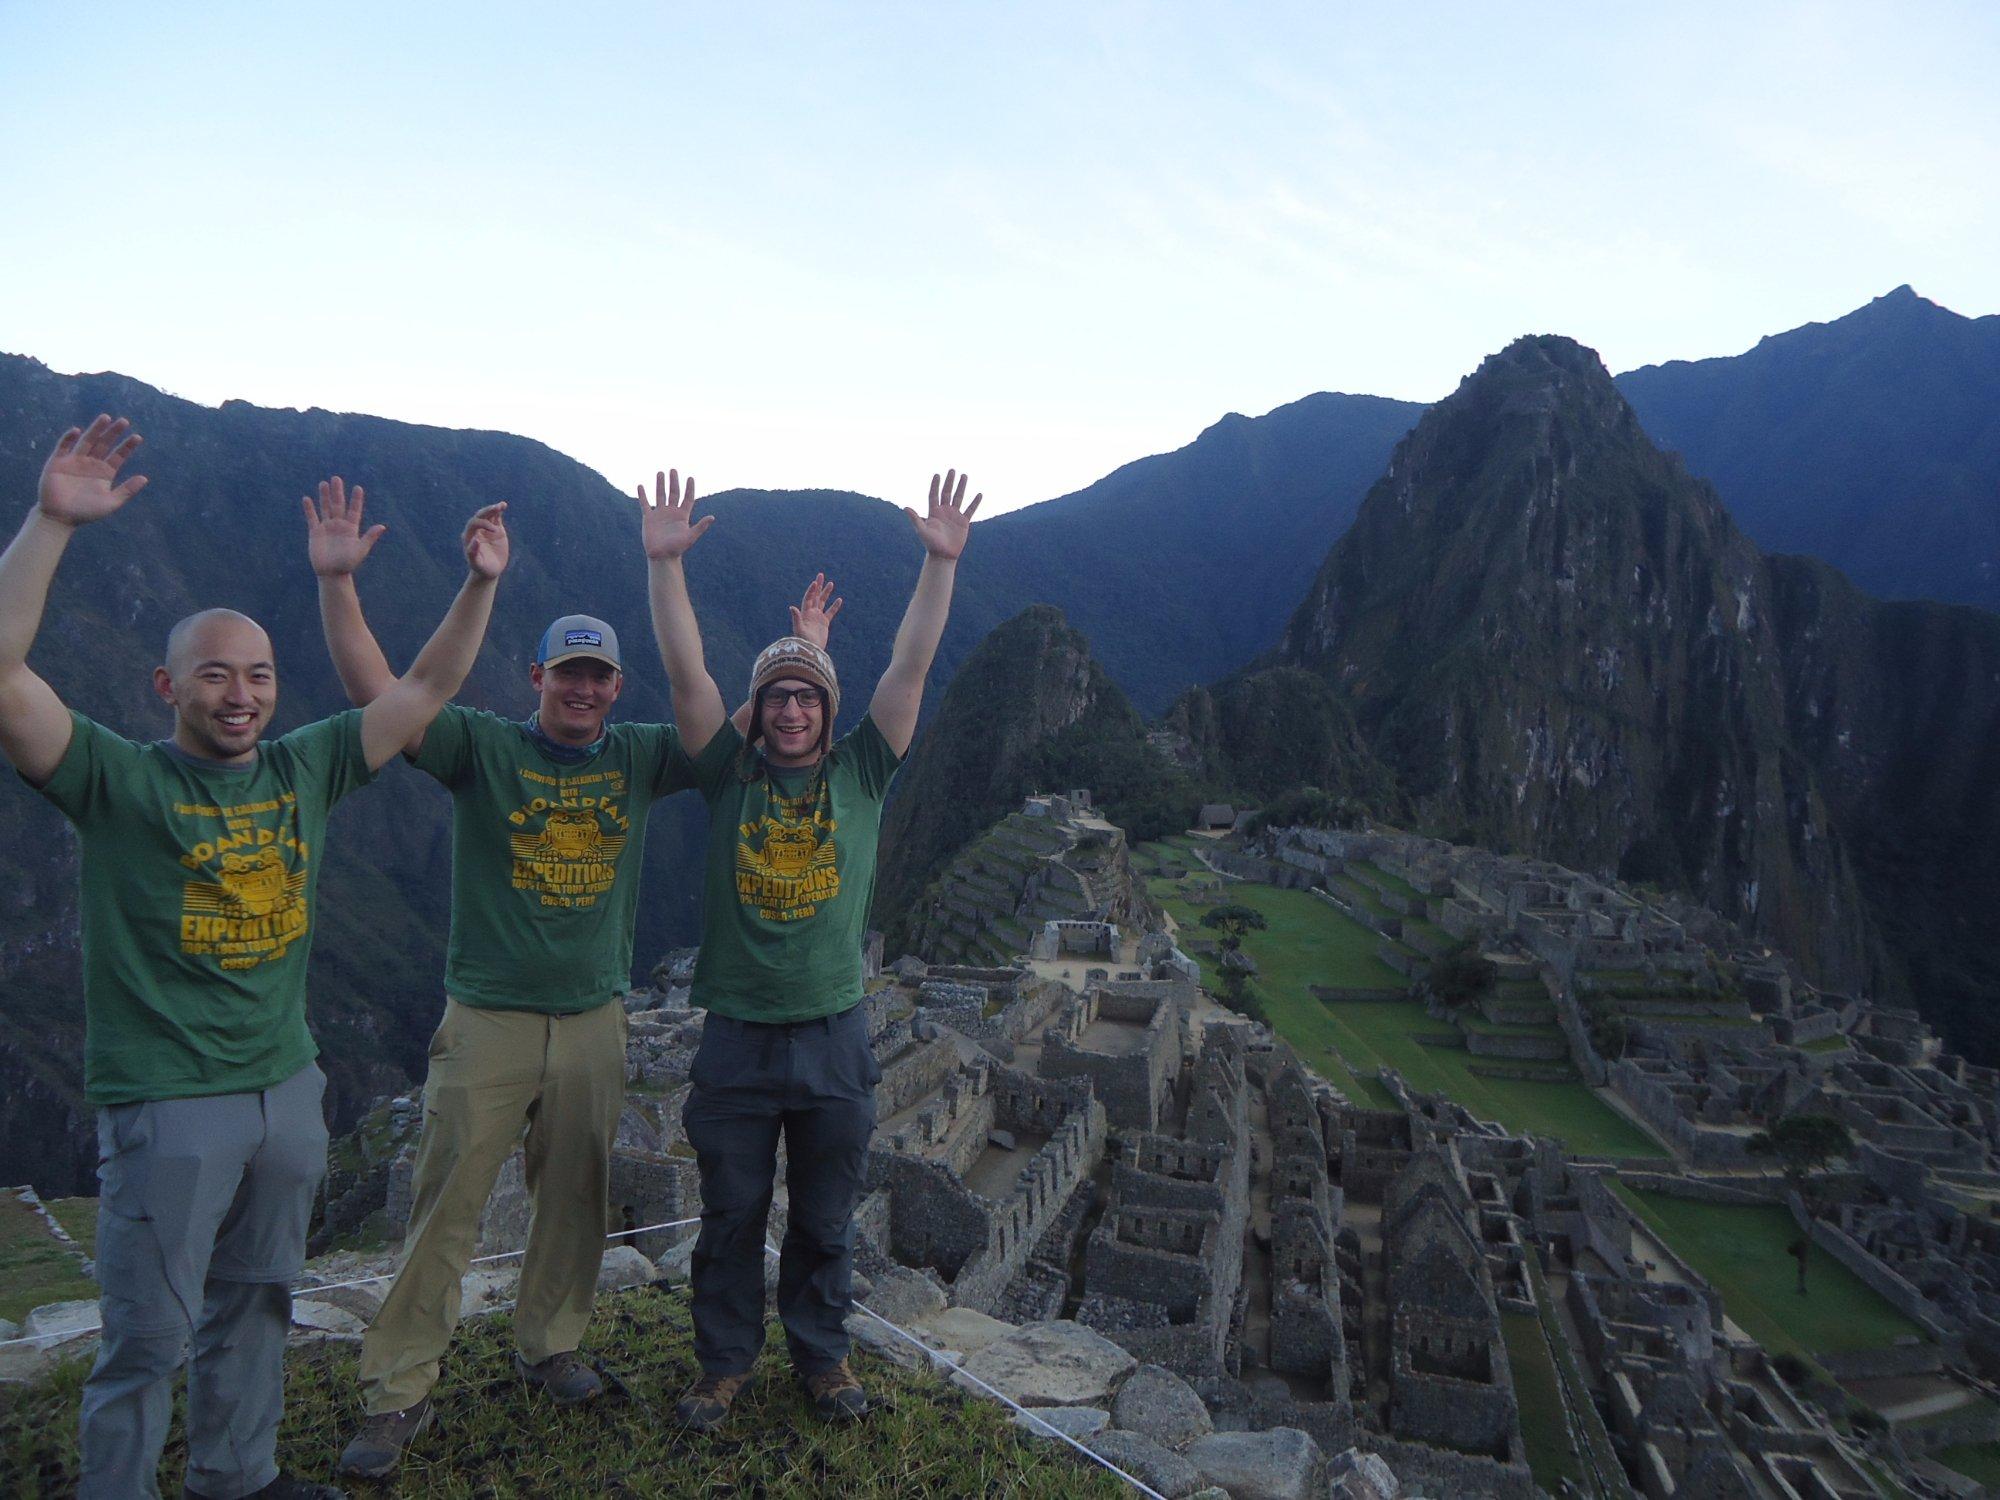 Explore the amazon jungle peru trip advisors - All Photos 249